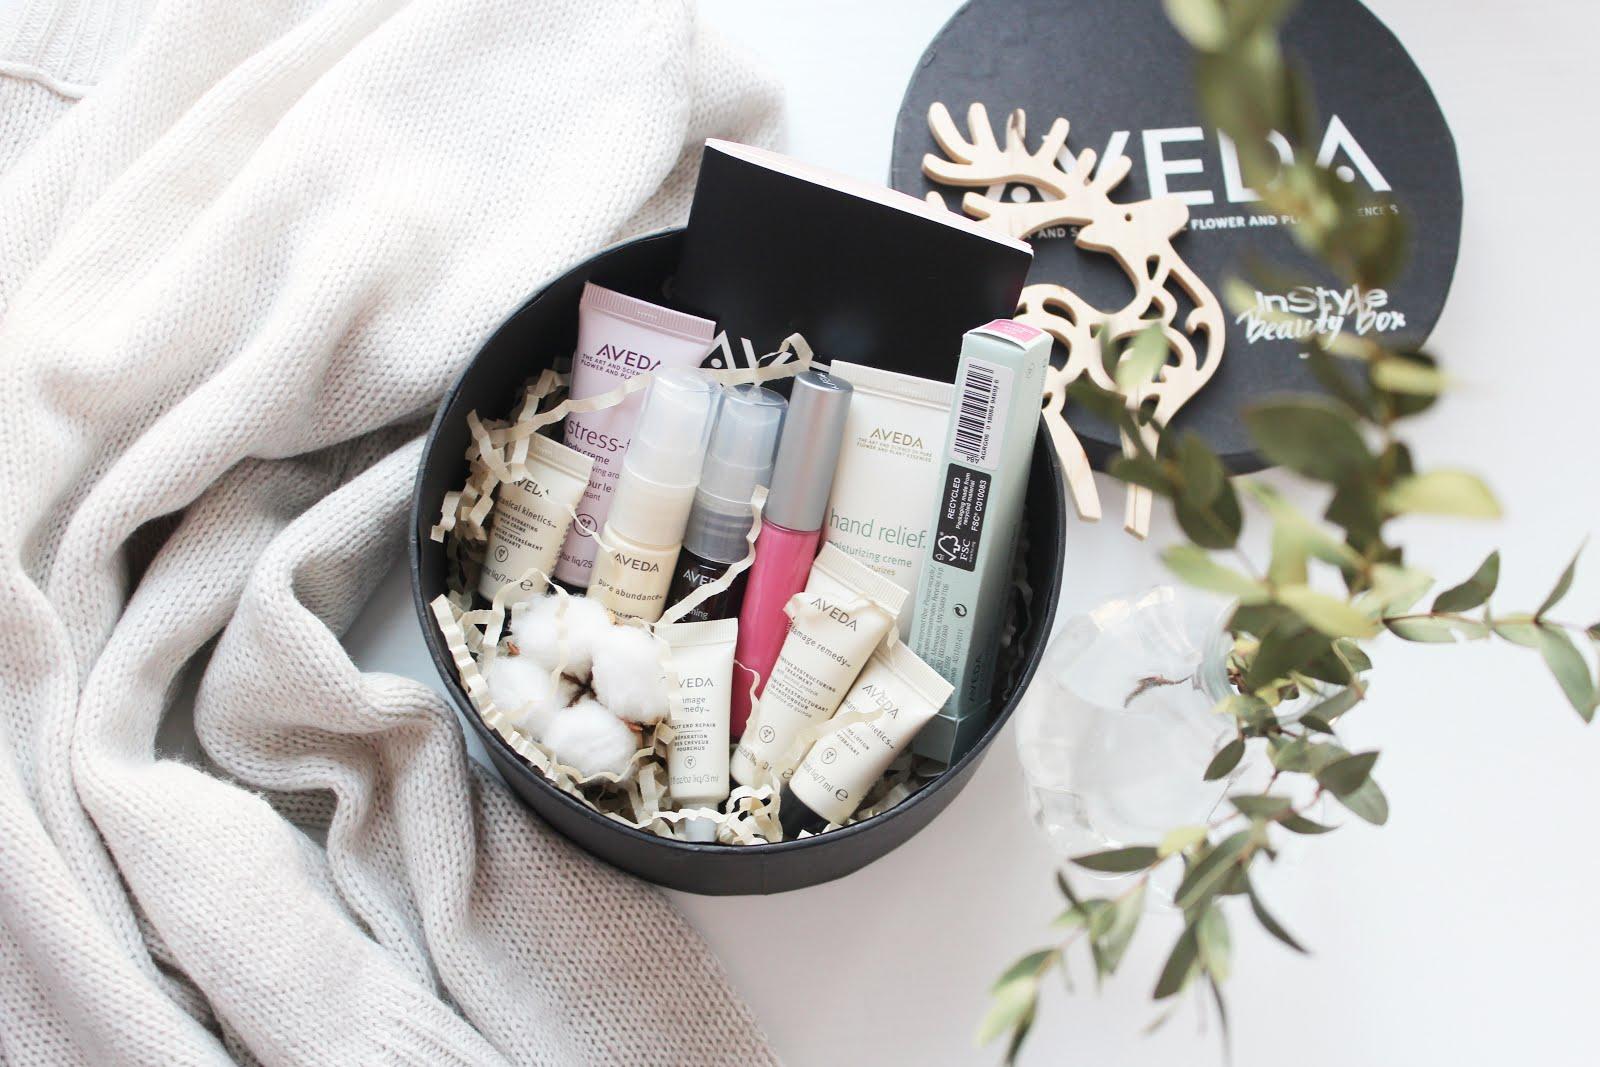 Обзор бьюти-коробочки Aveda от InStyle Beauty Box/МОНОБРЕНДОВАЯ КОРОБОЧКА AVEDA